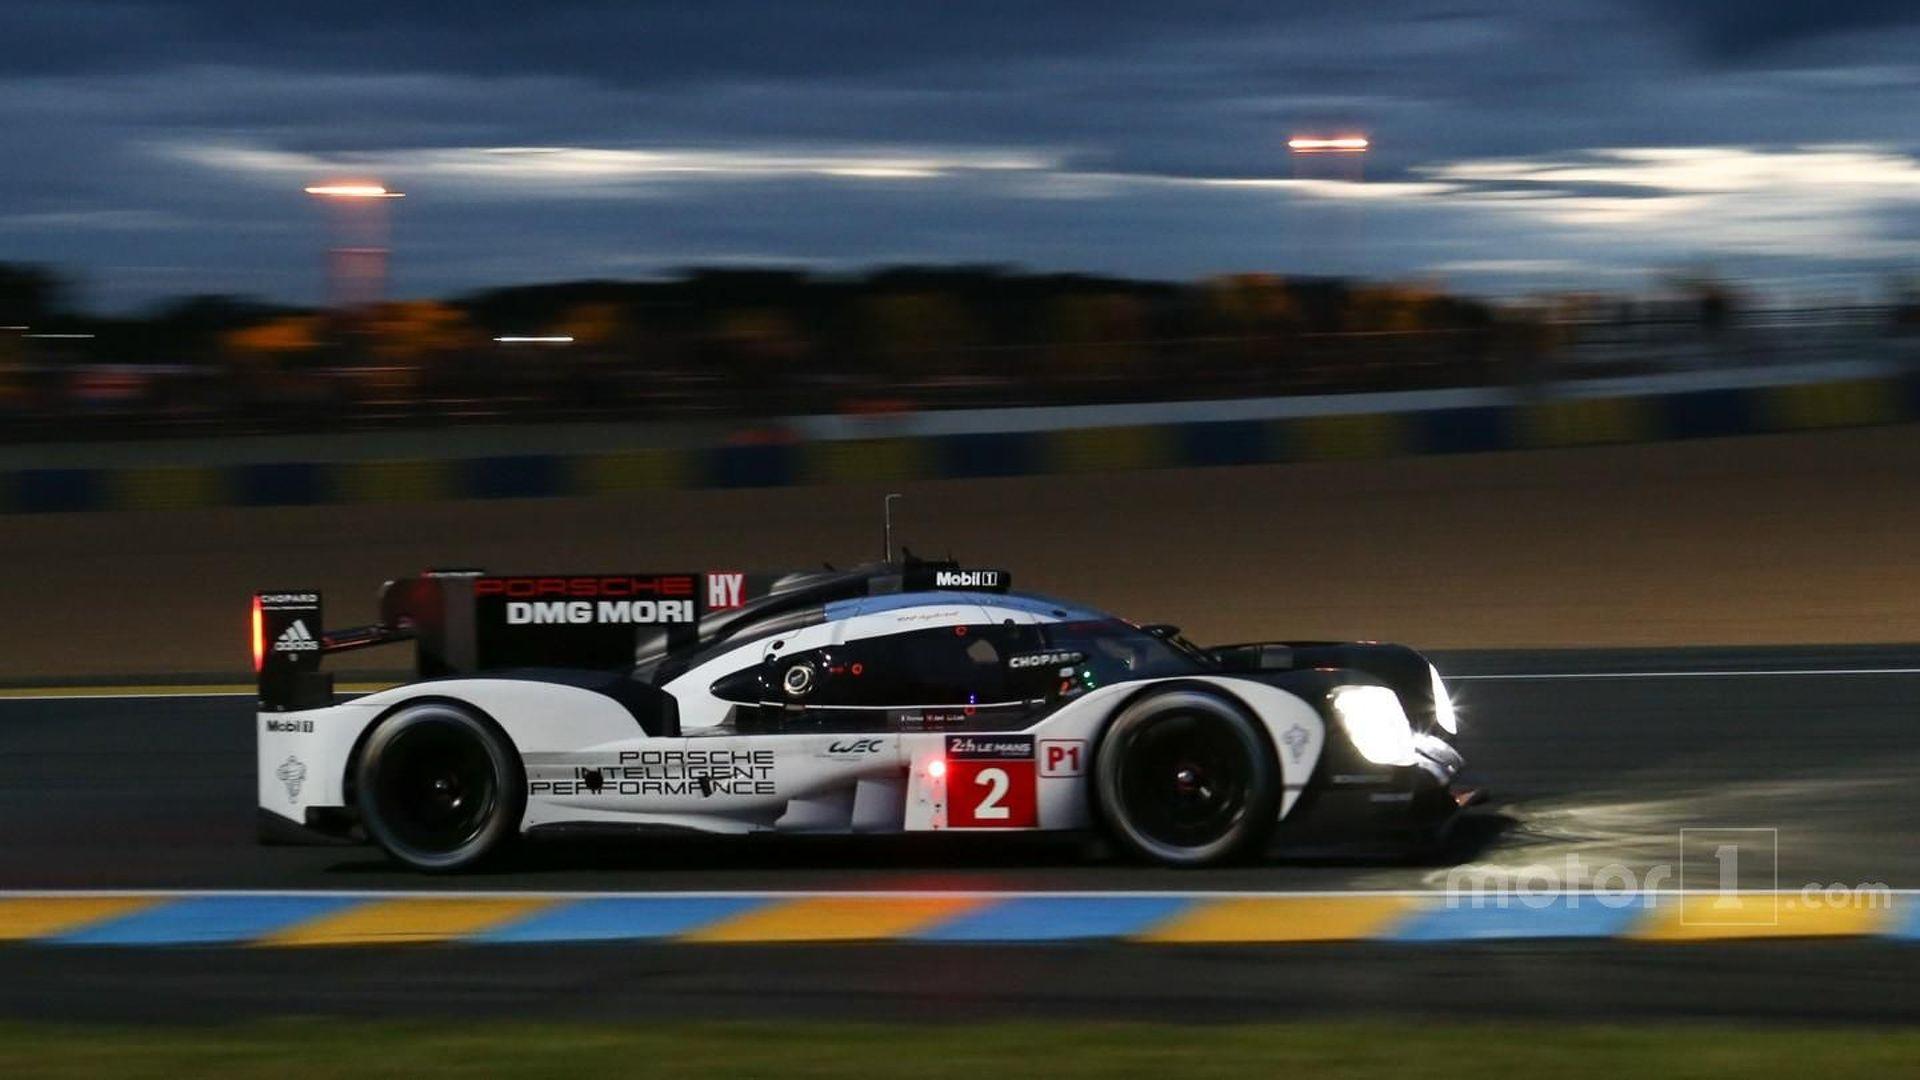 Le Mans 24 Hours: Jani takes provisional pole for Porsche